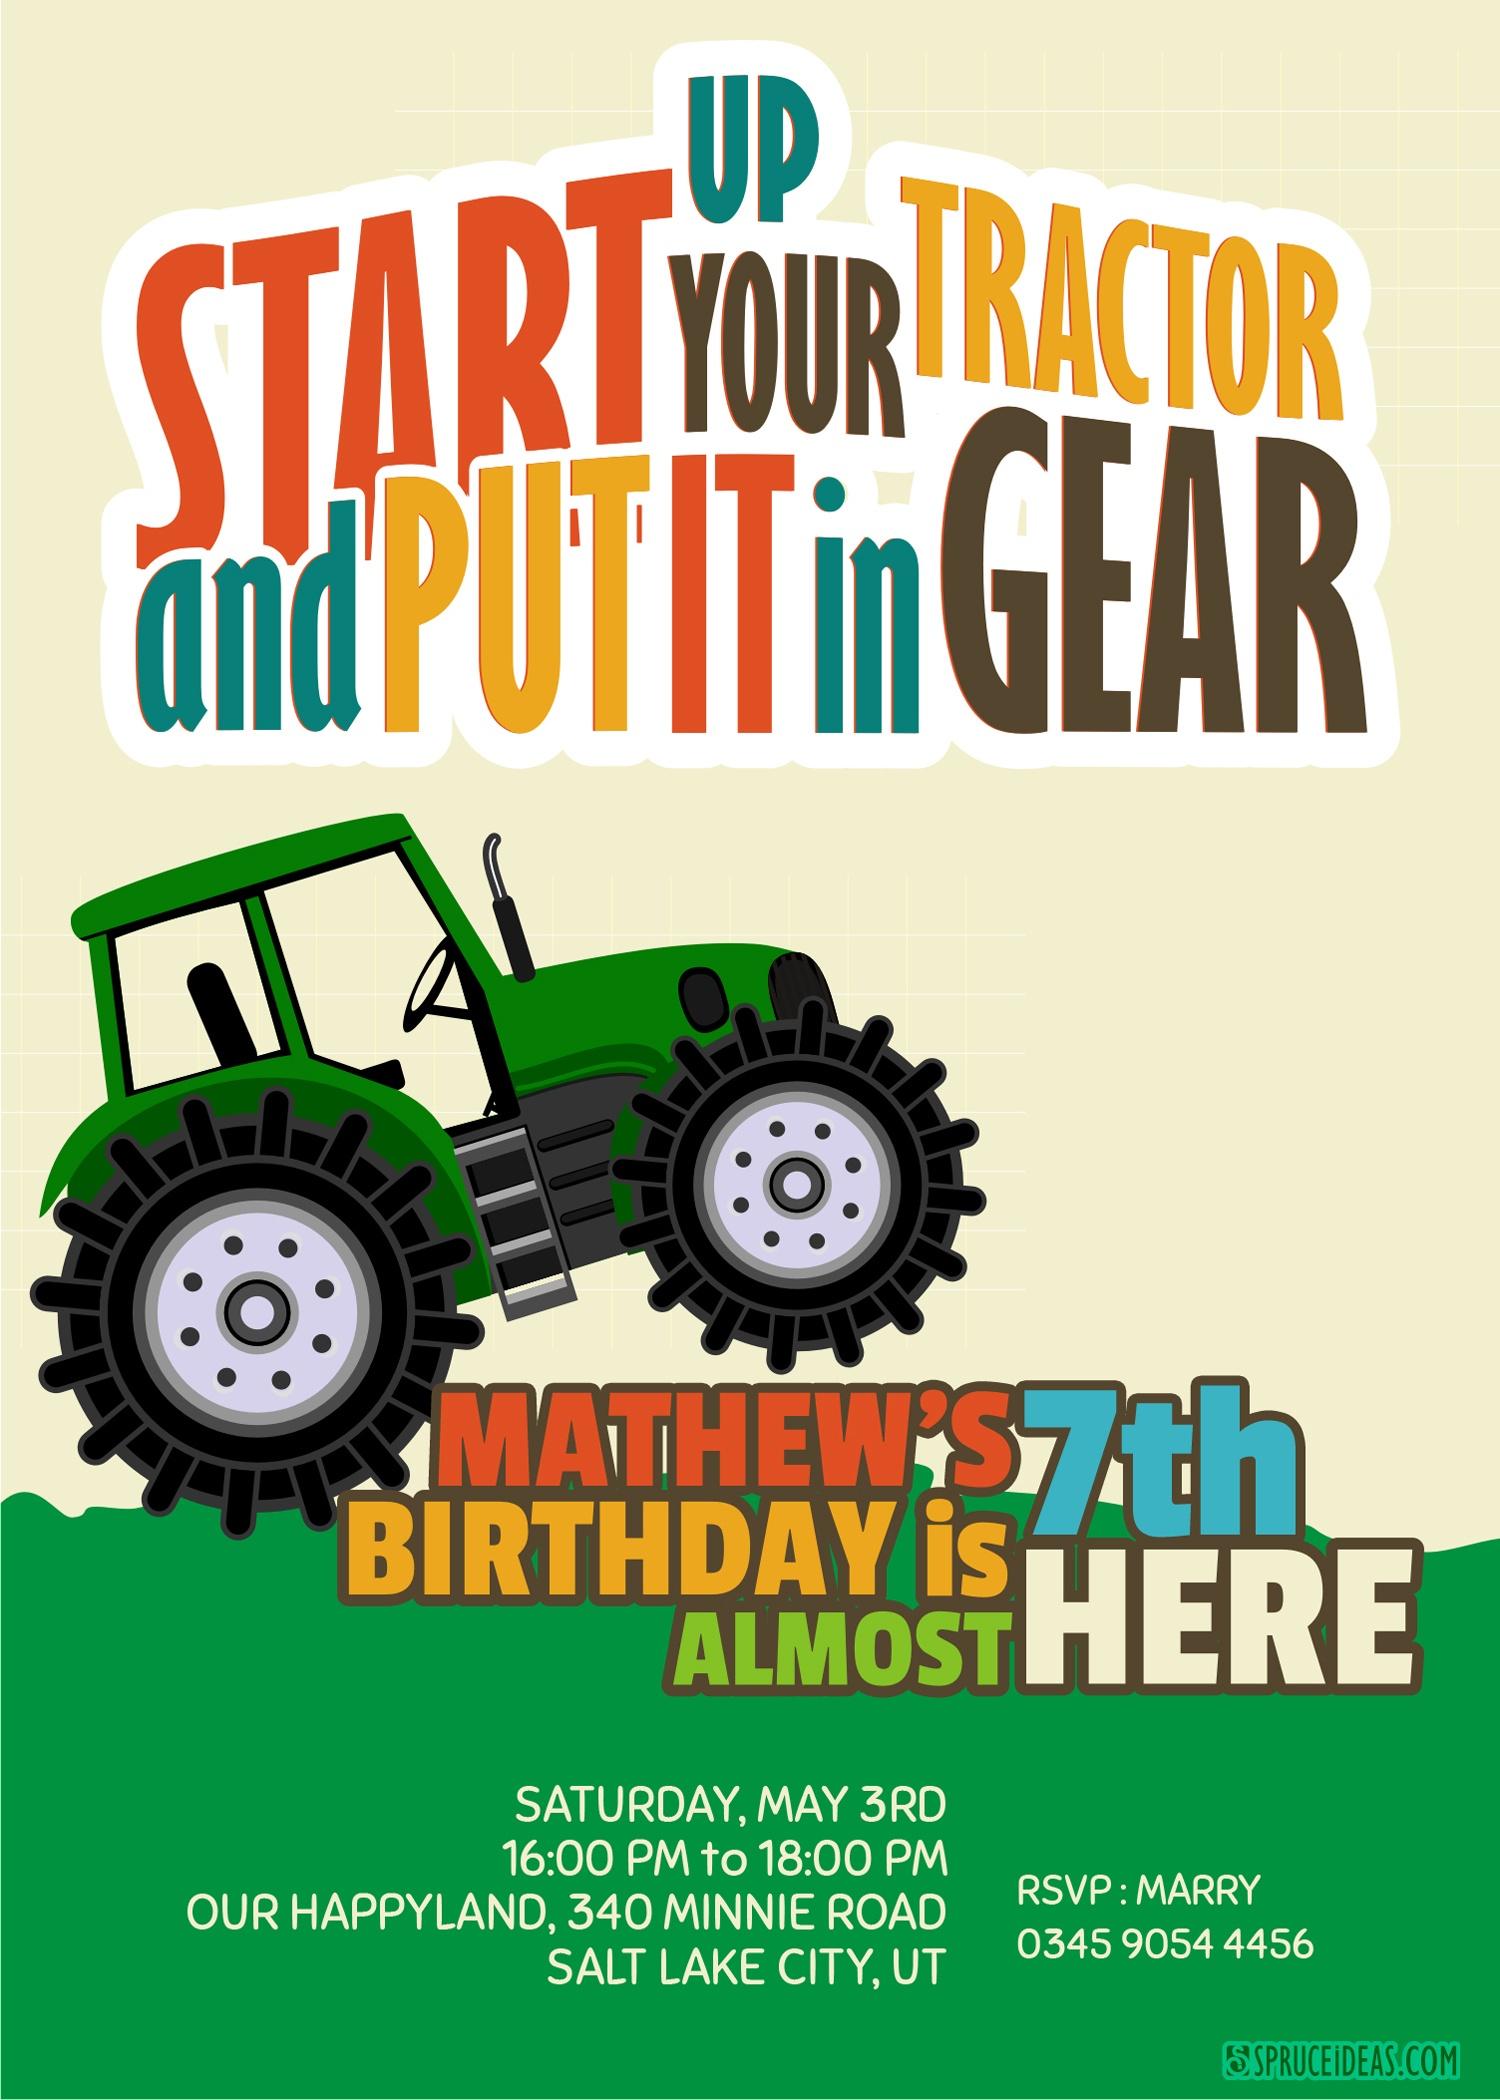 Free Printable John Deere Tractor Birthday Invitation Template - Free Printable John Deere Birthday Invitations